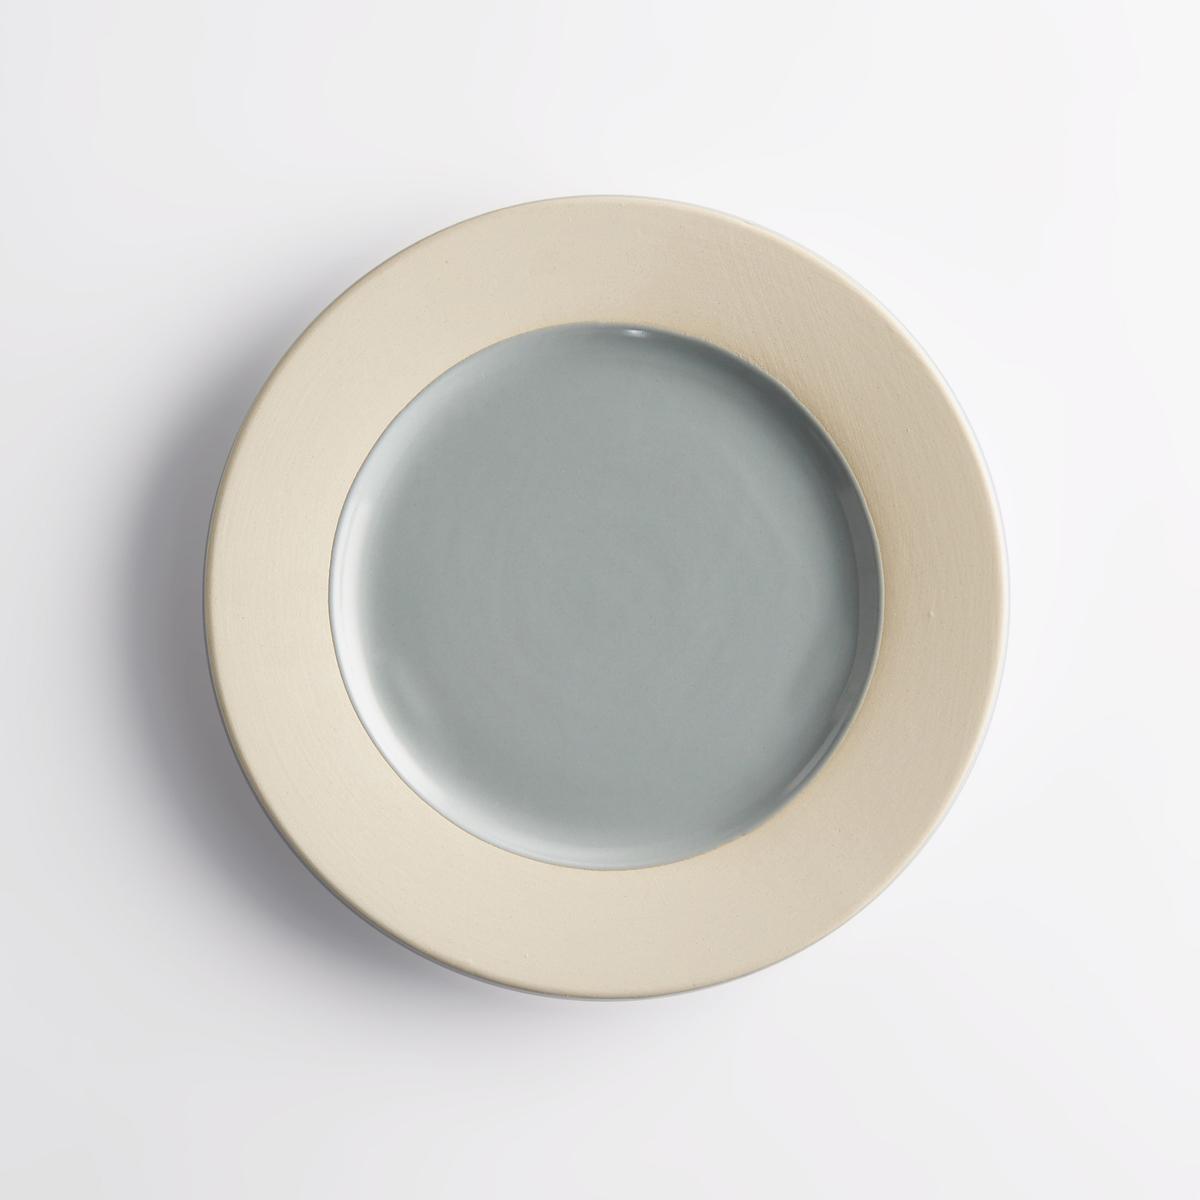 Комплект из 4 десертных тарелок из керамики Warota